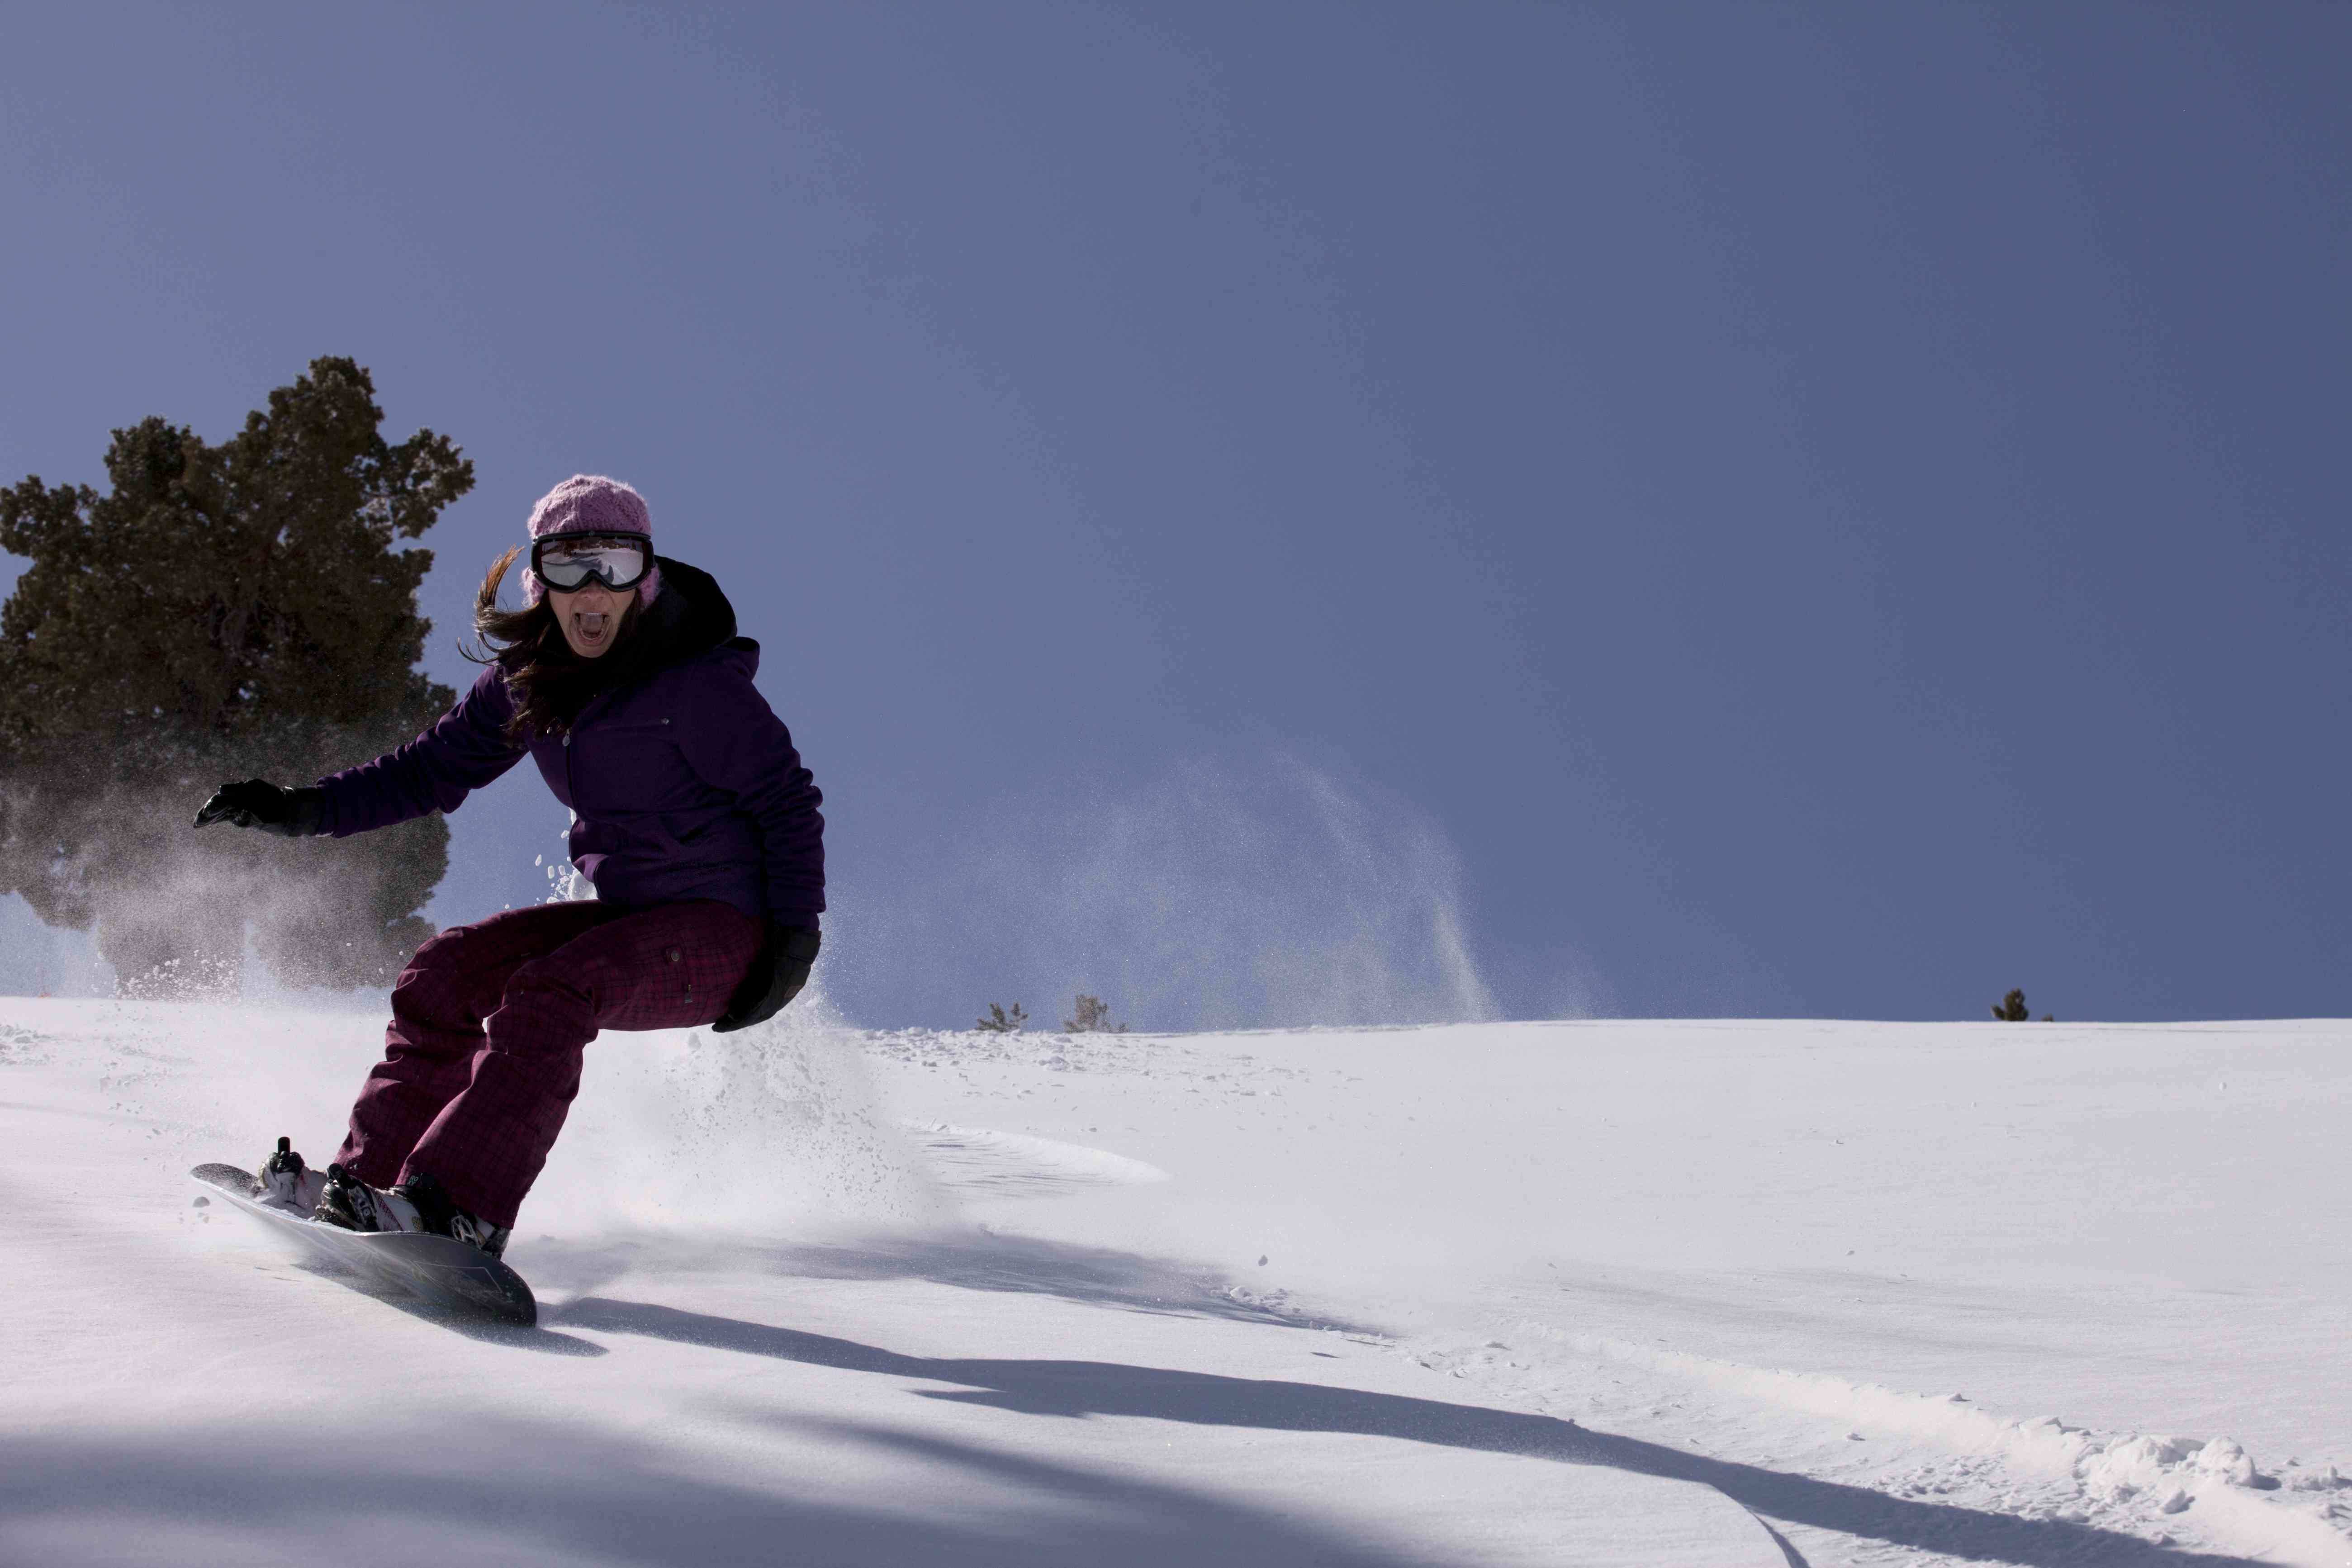 Snowboarder at Big Bear, Califorina